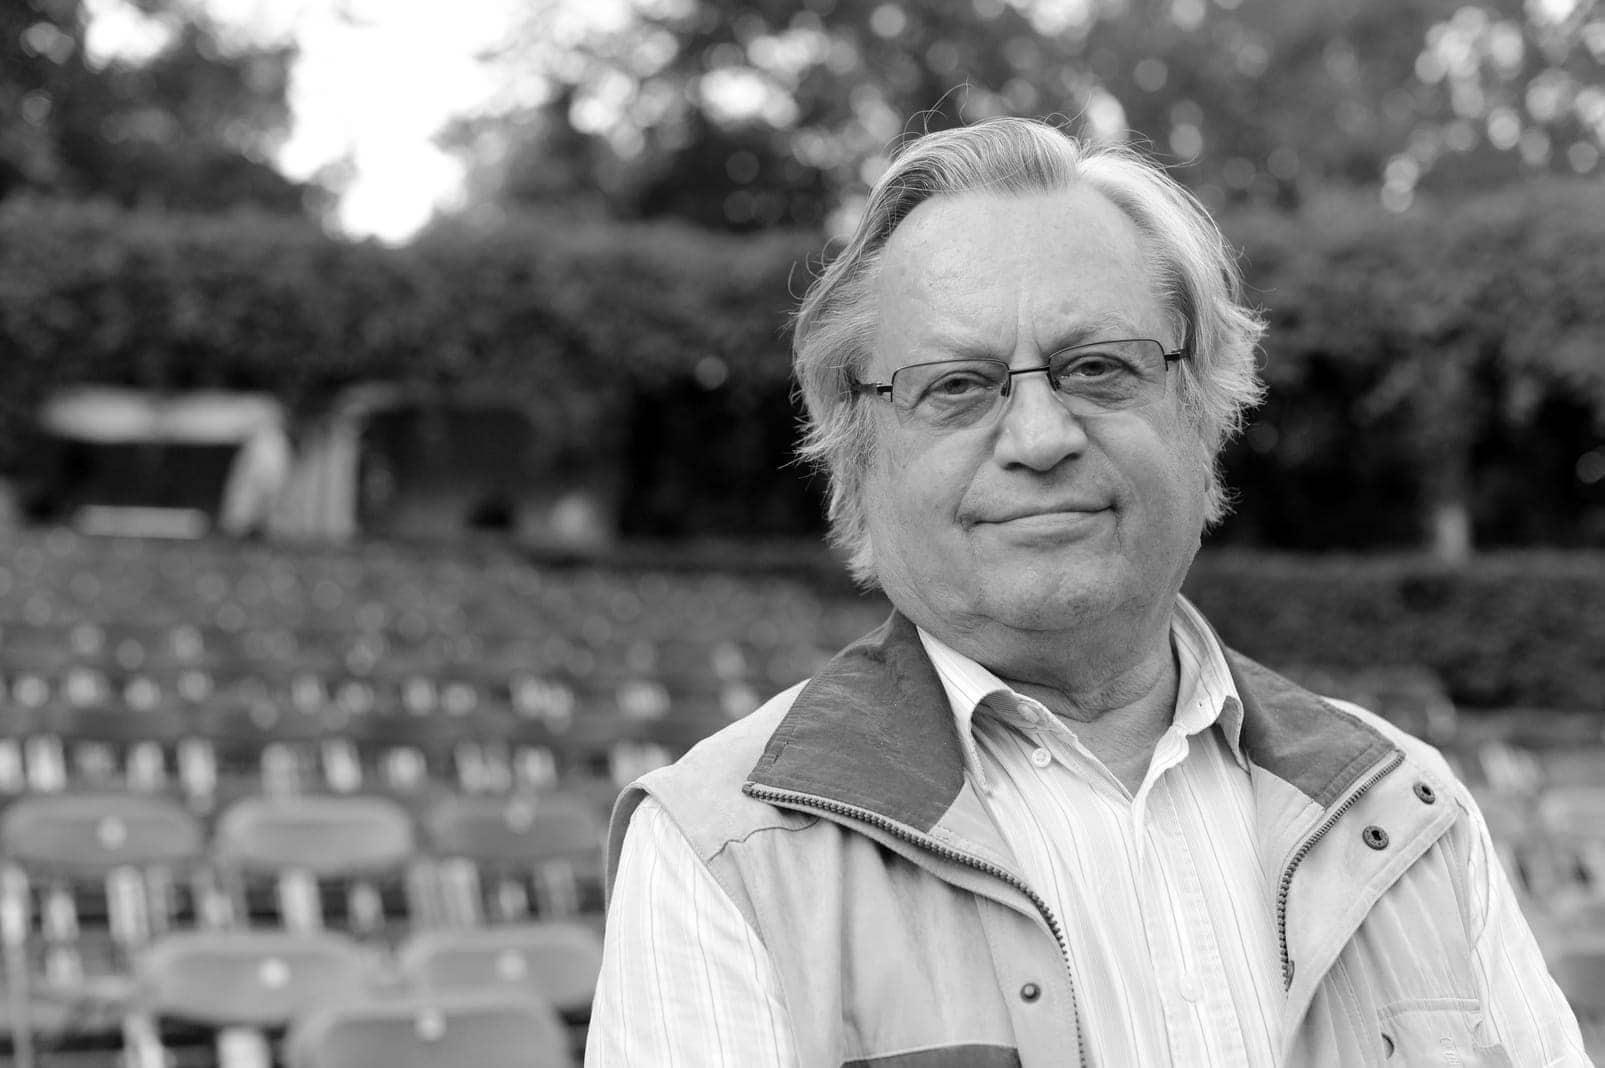 Siegfried Matthus 2013